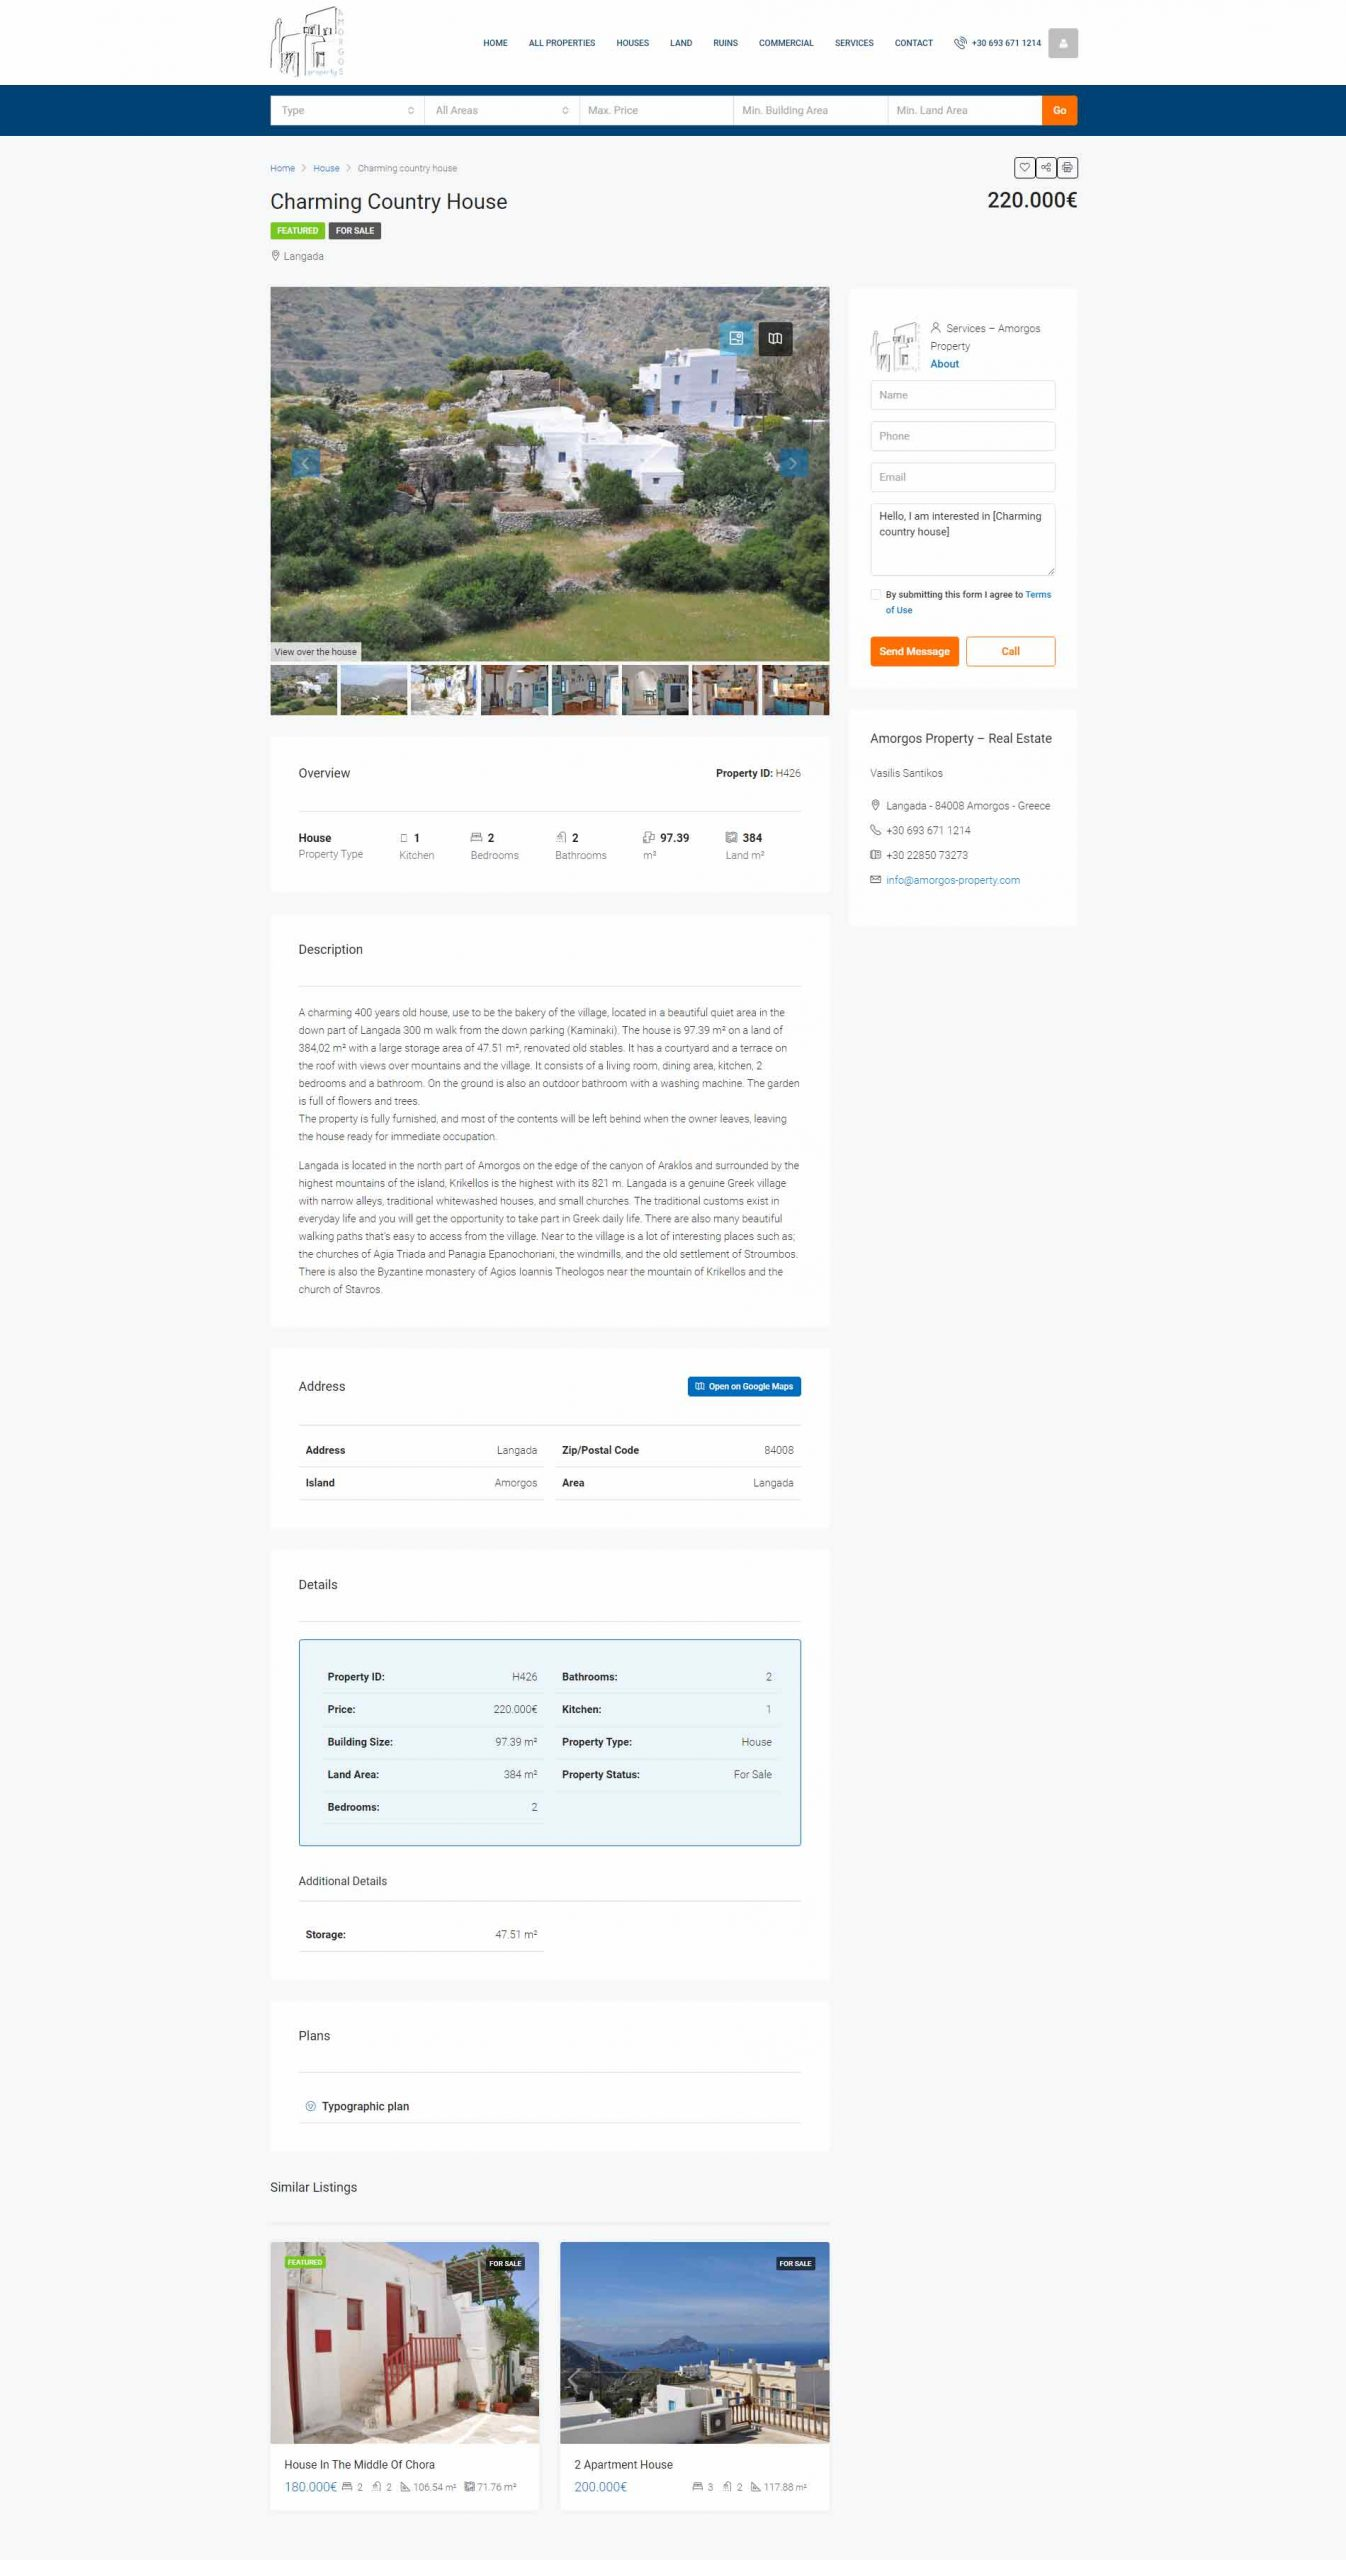 Website design anweb Amorgos Property